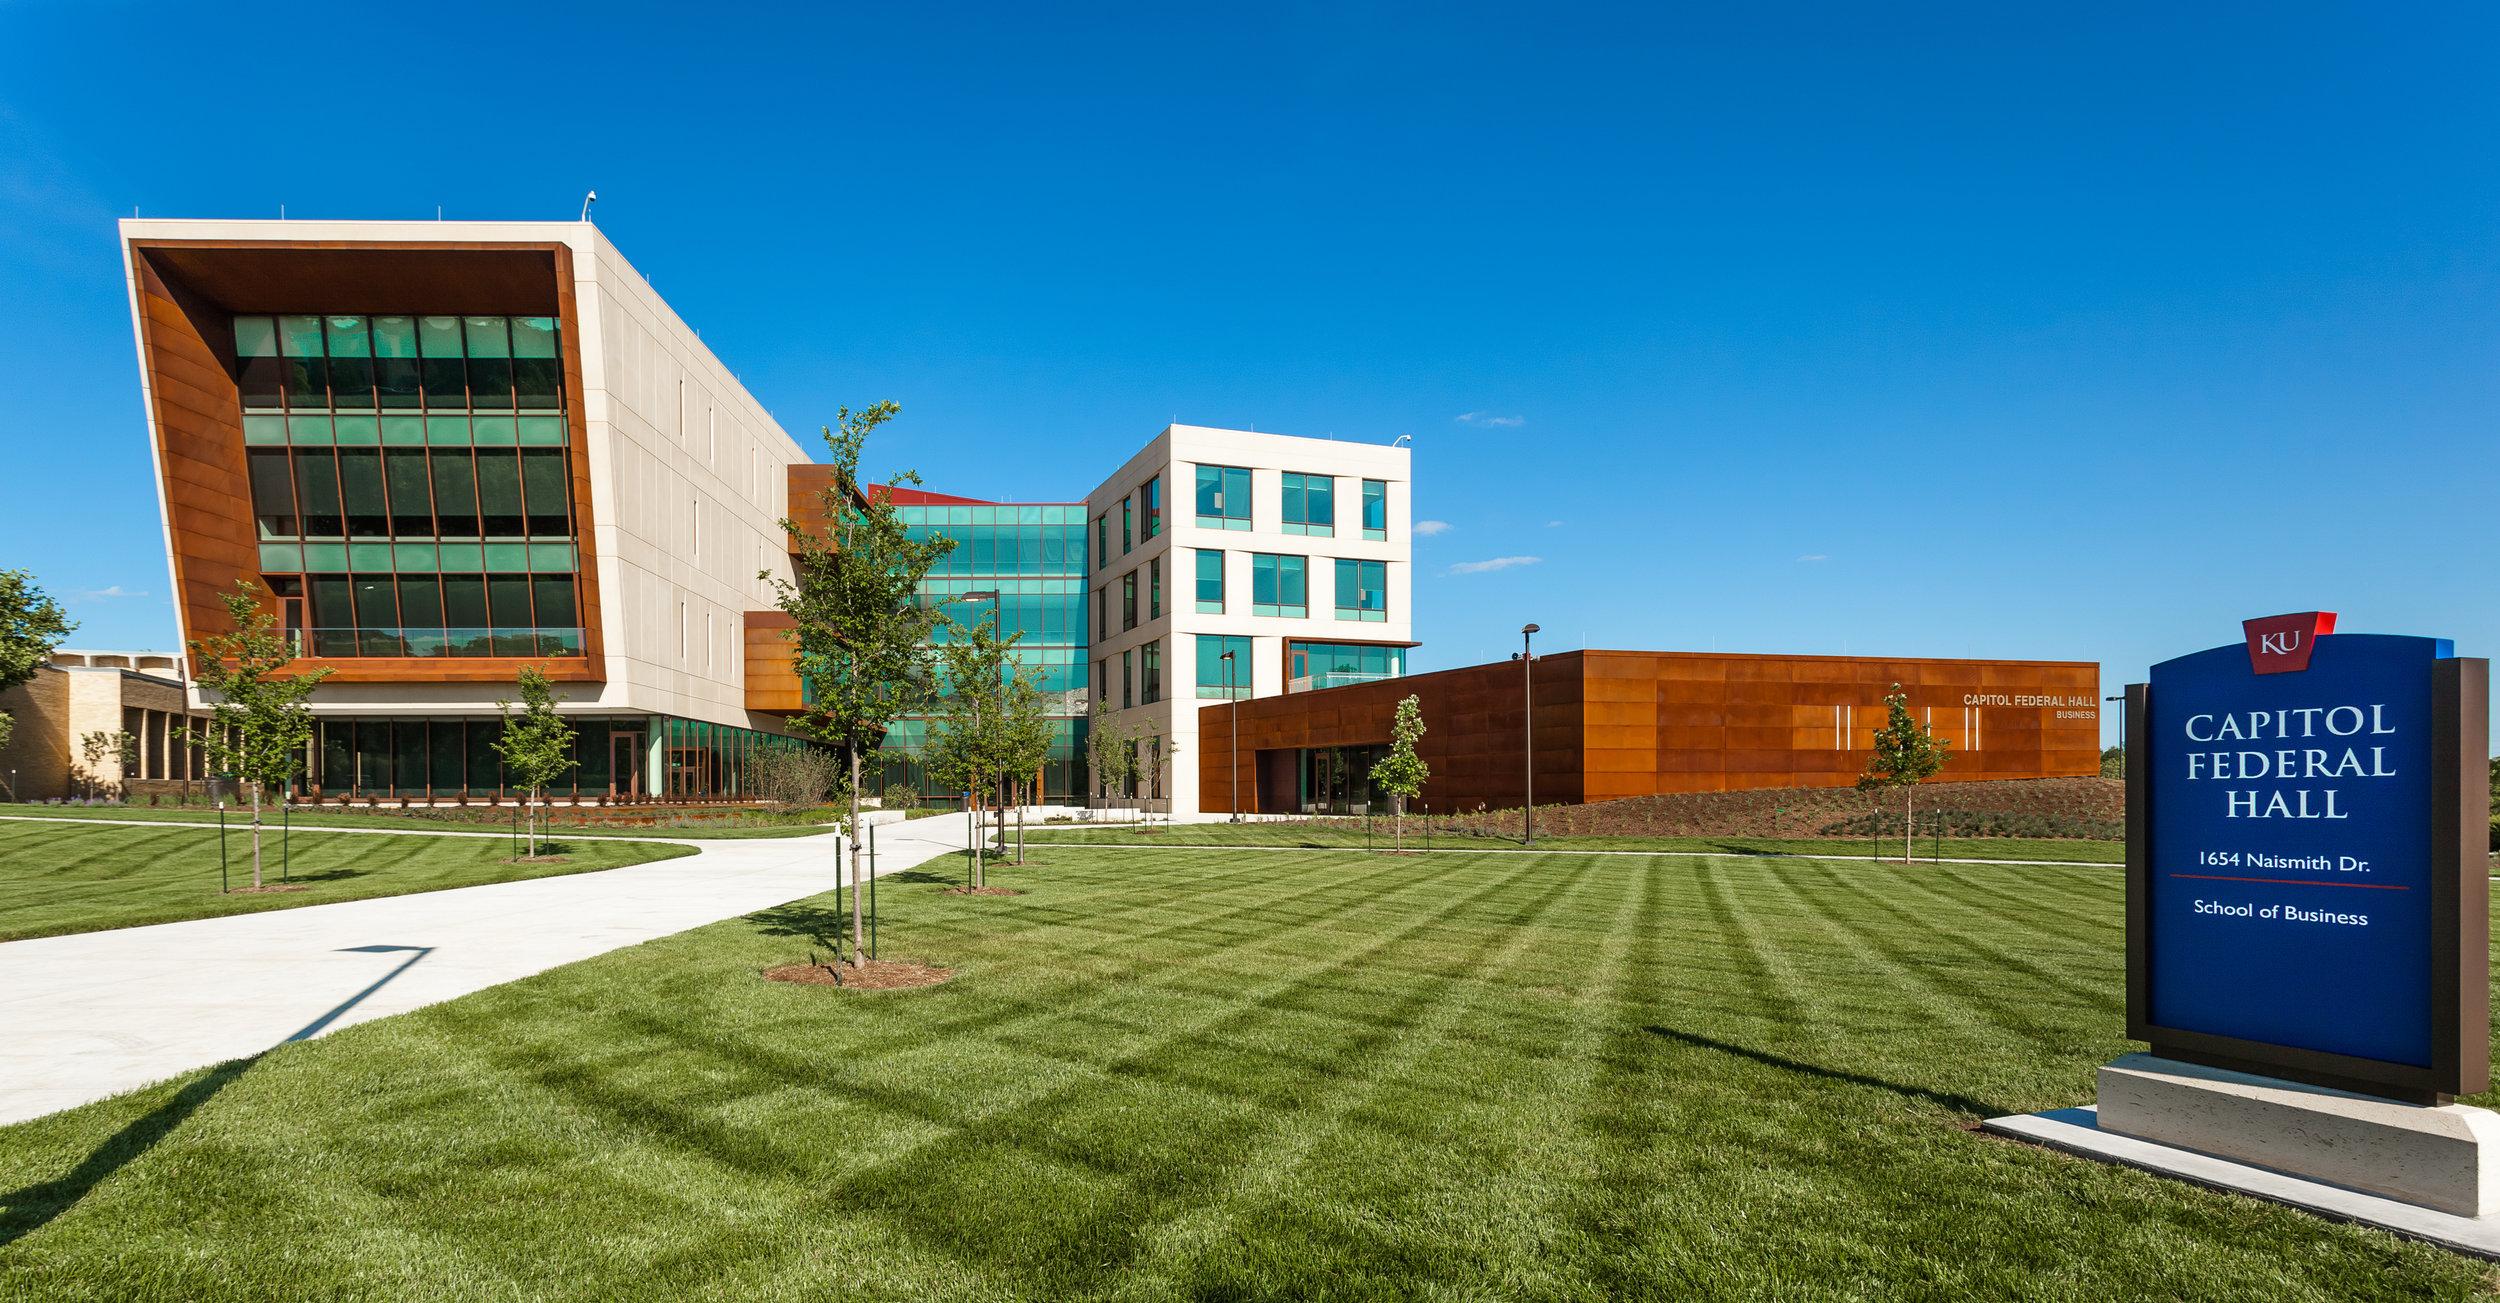 Univeristy of Kansas - Capital Federal Hall